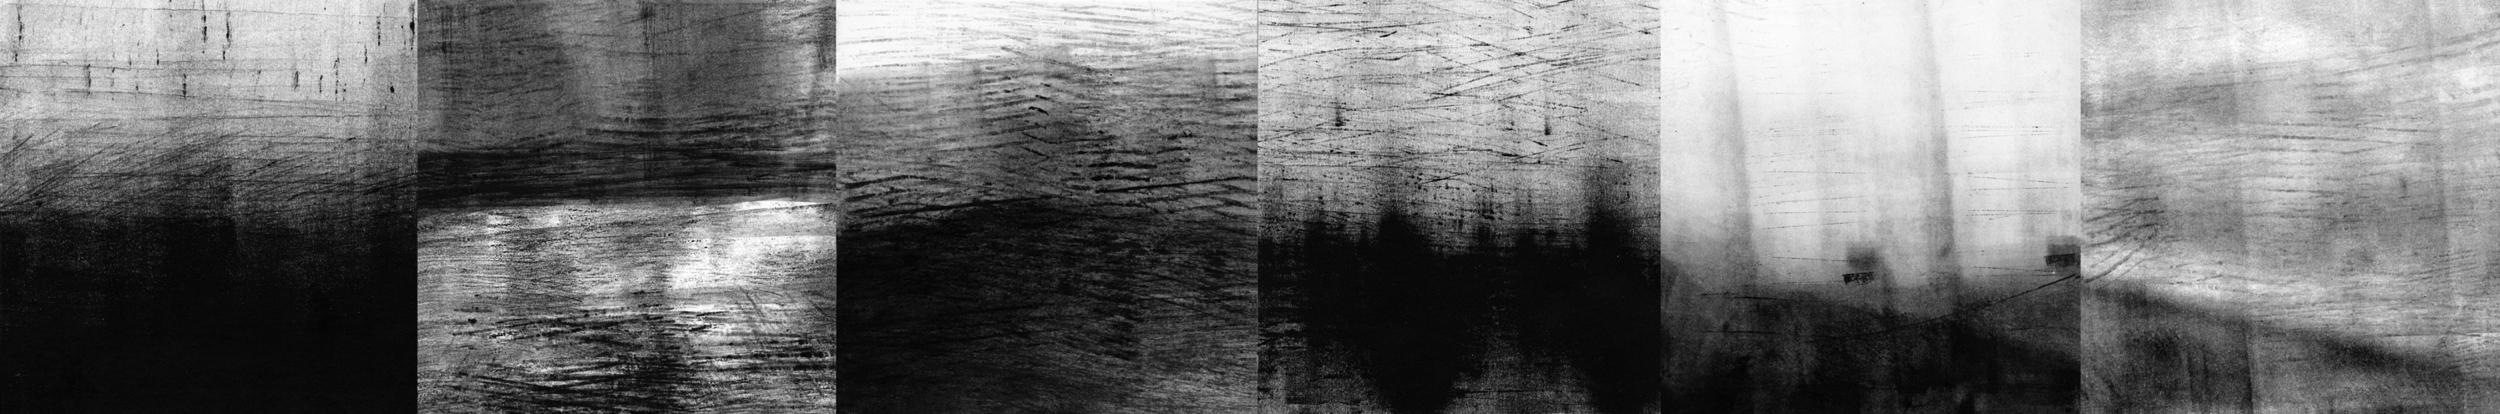 """Overlook"" 2013   8"" x 48""  Inked paper mounted on wood panels"